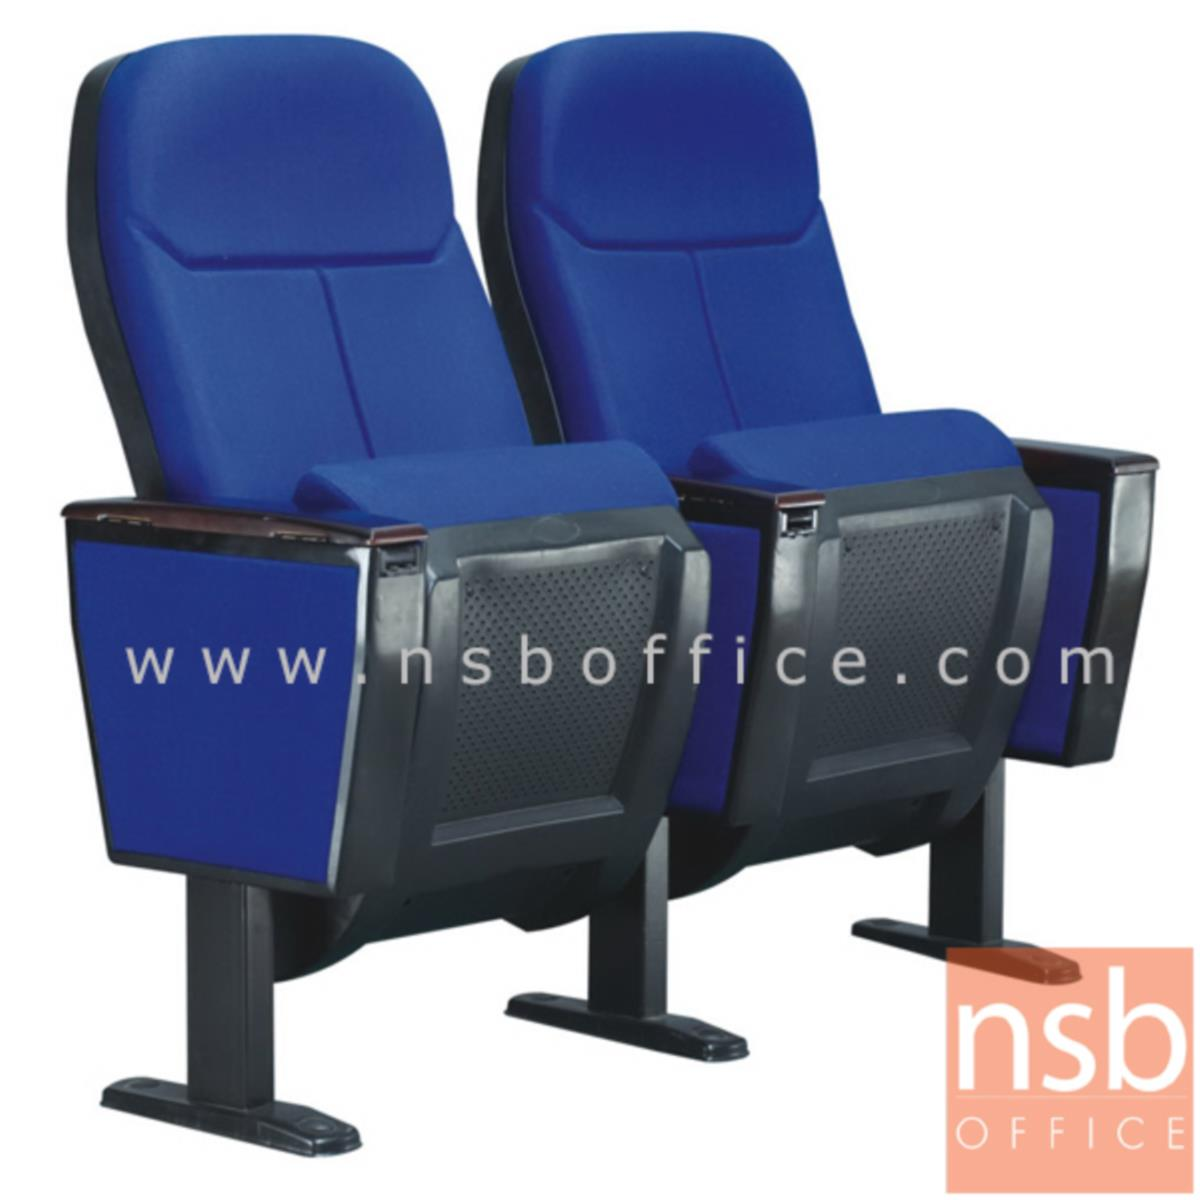 B19A004:เก้าอี้หอประชุม  รุ่น AD-01 แบบแขนกล่อง ที่นั่งพับเก็บได้